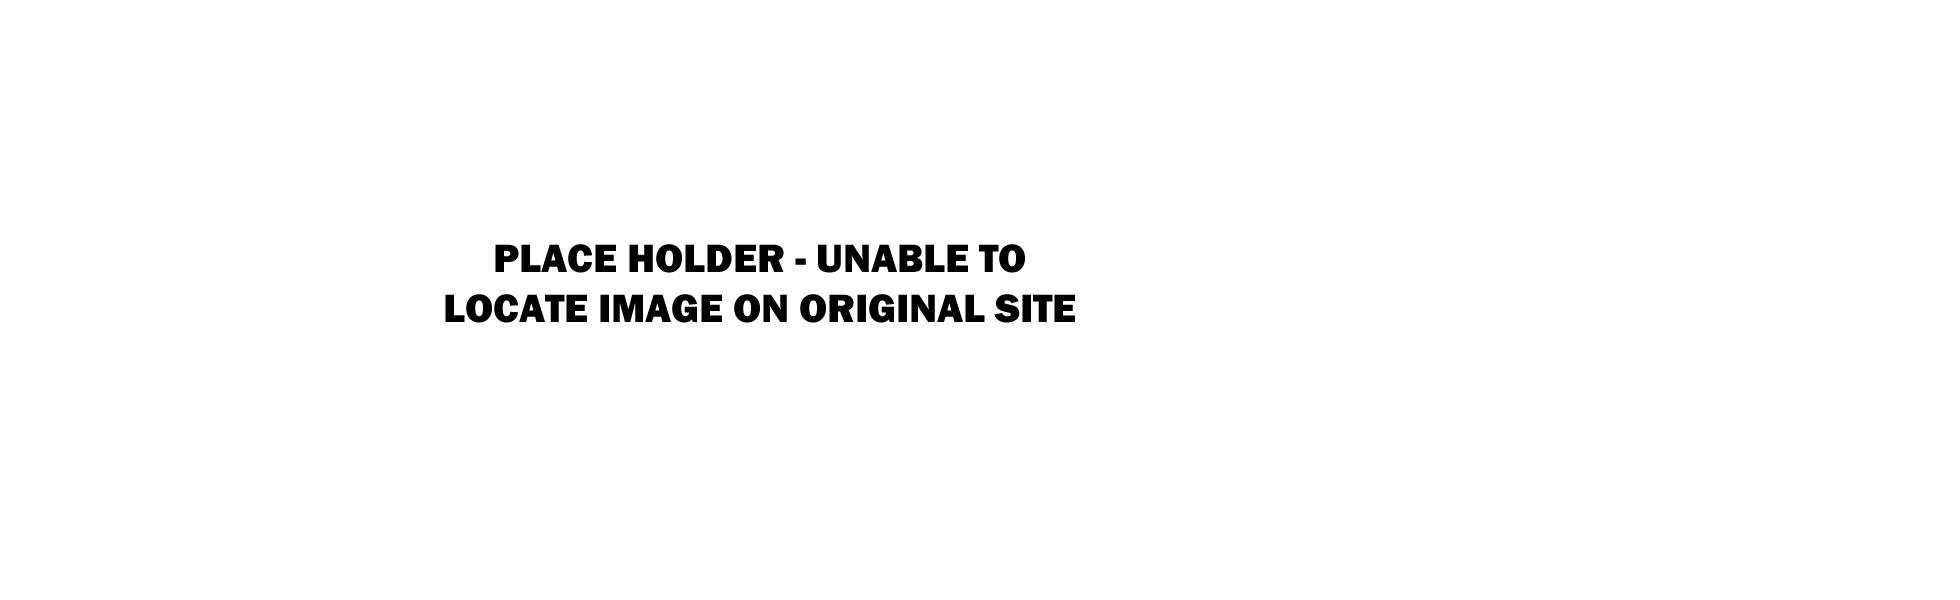 pllaceholder image